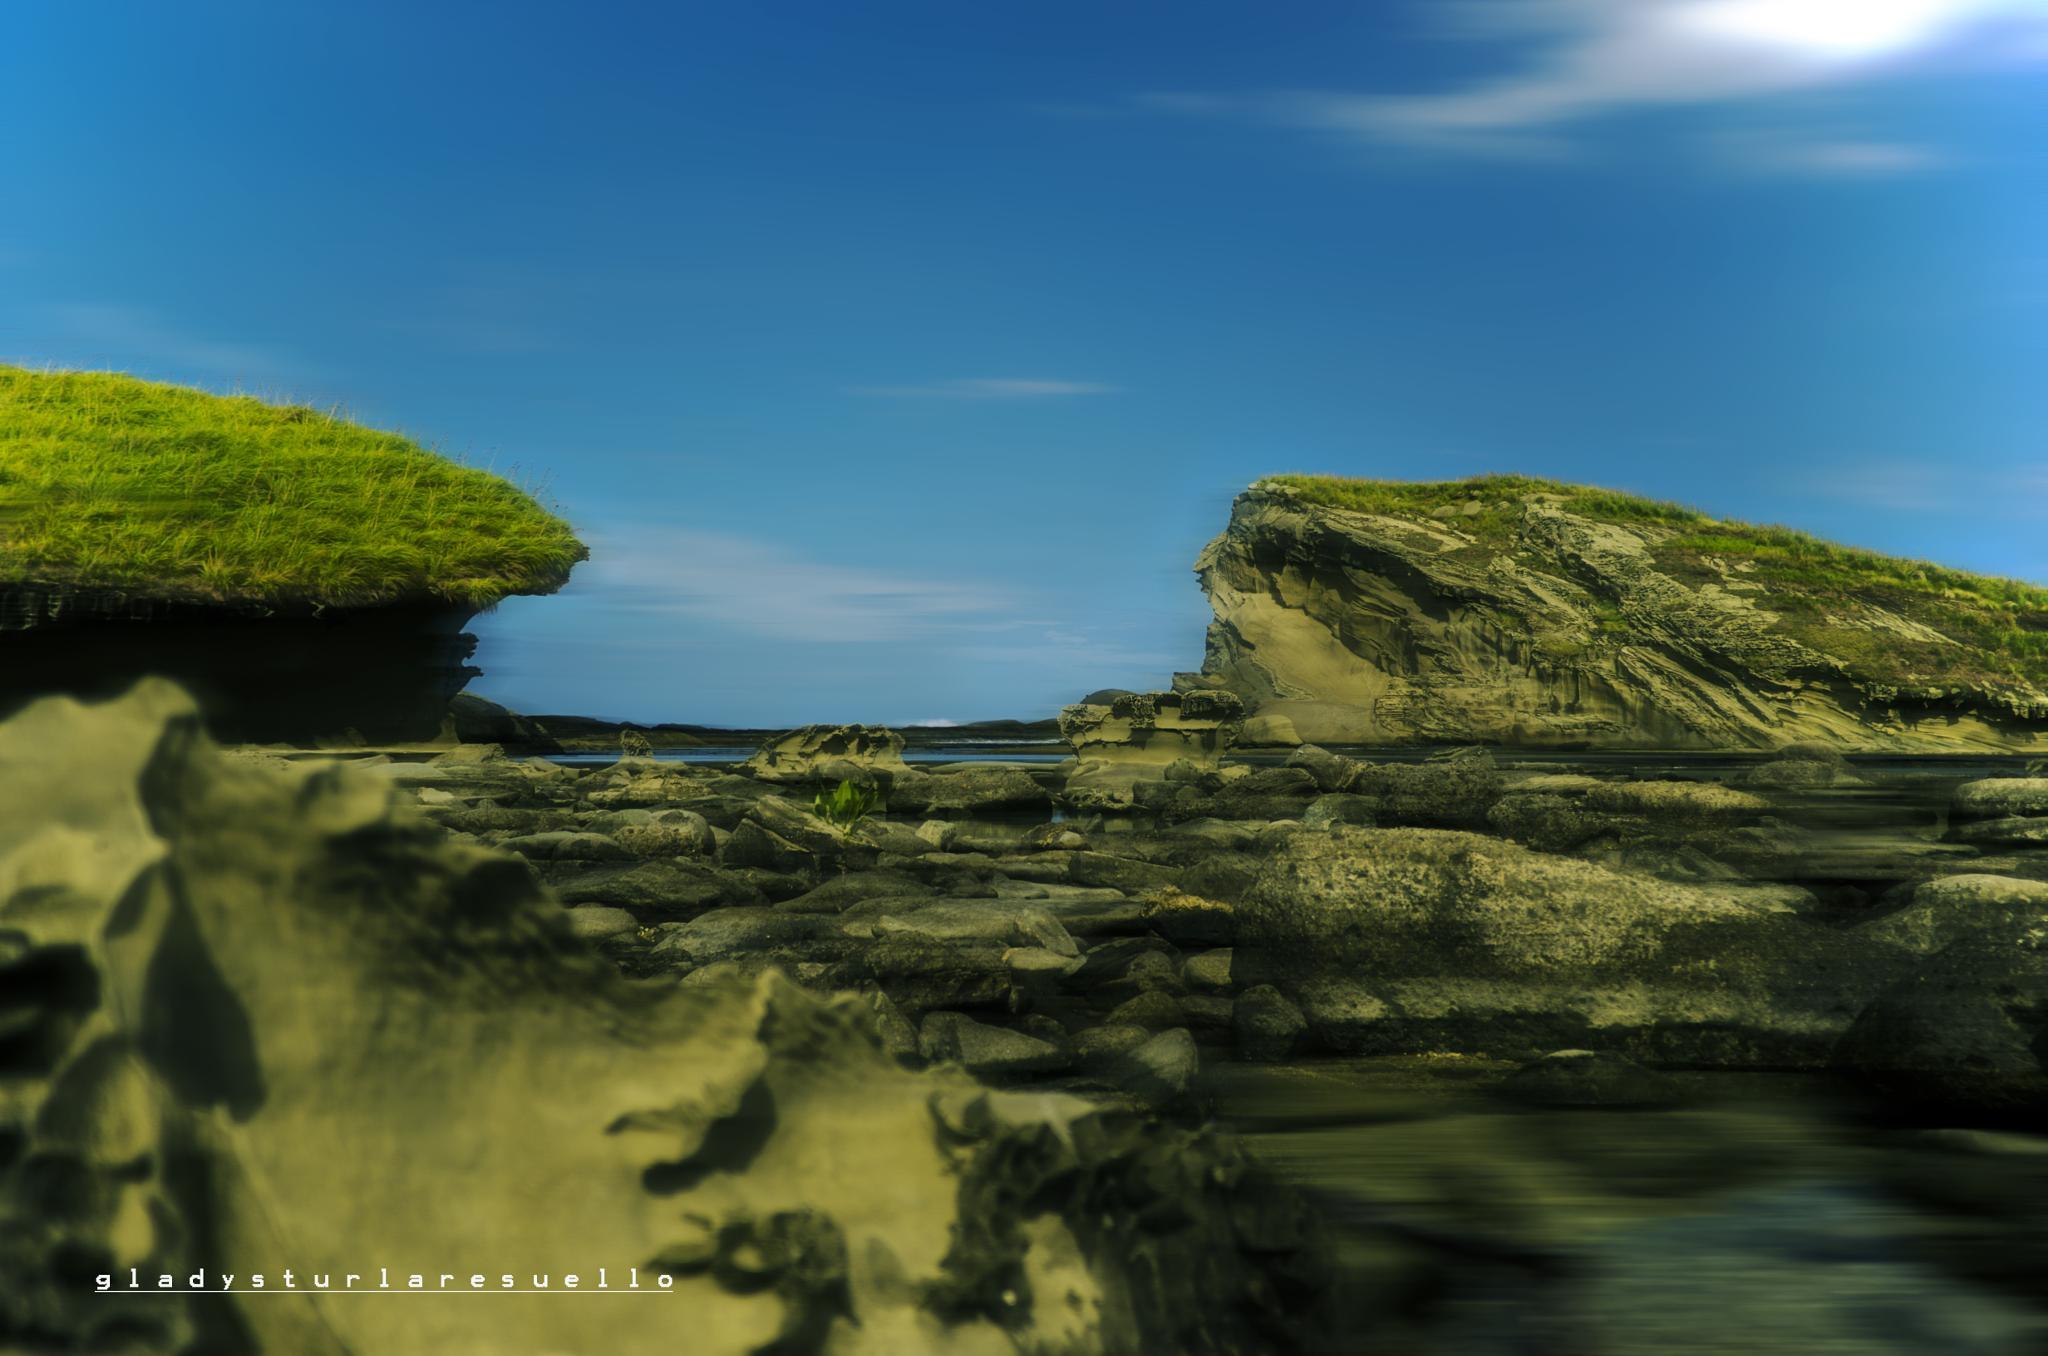 BIRI ISLAND by tresuellogladz